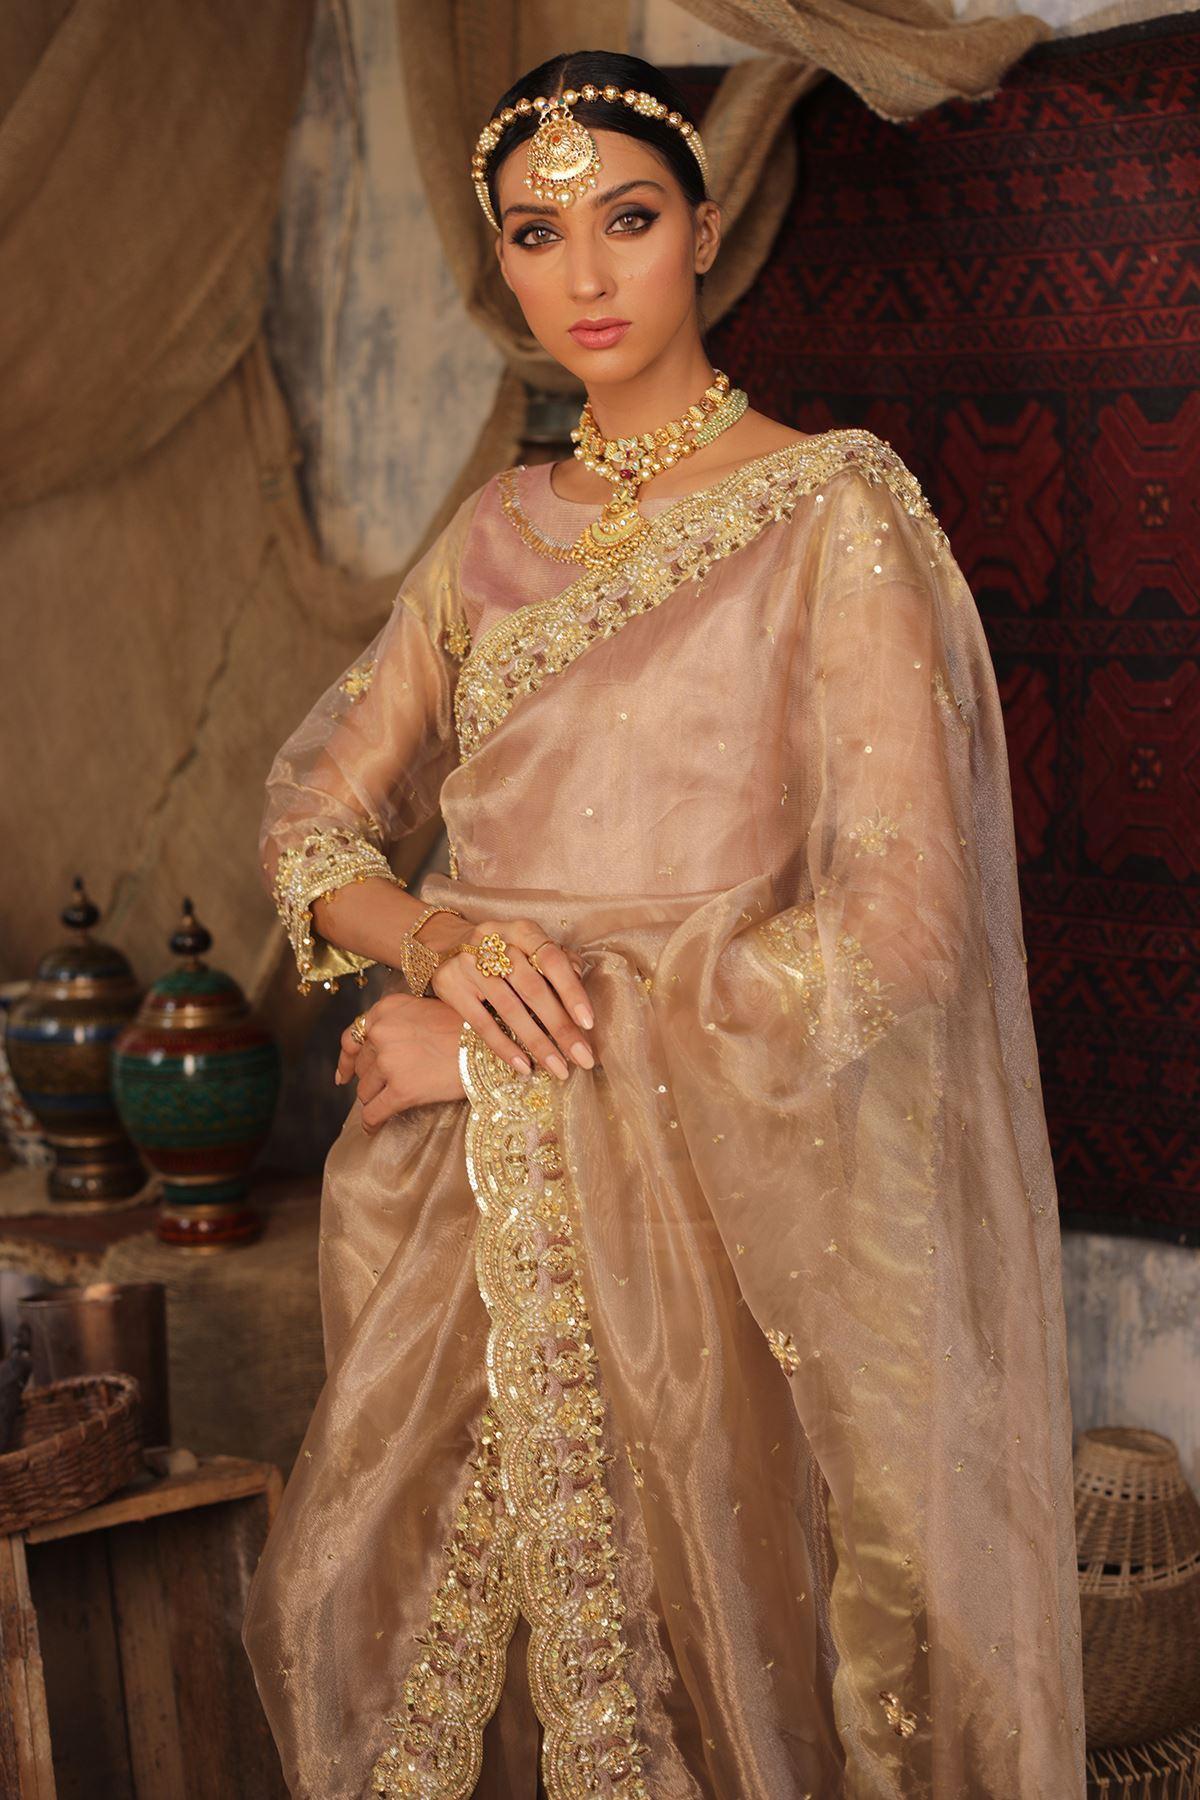 Moazzam Khan Party Wear 3PC Saree Blouse Petti Coat in Peach for Women